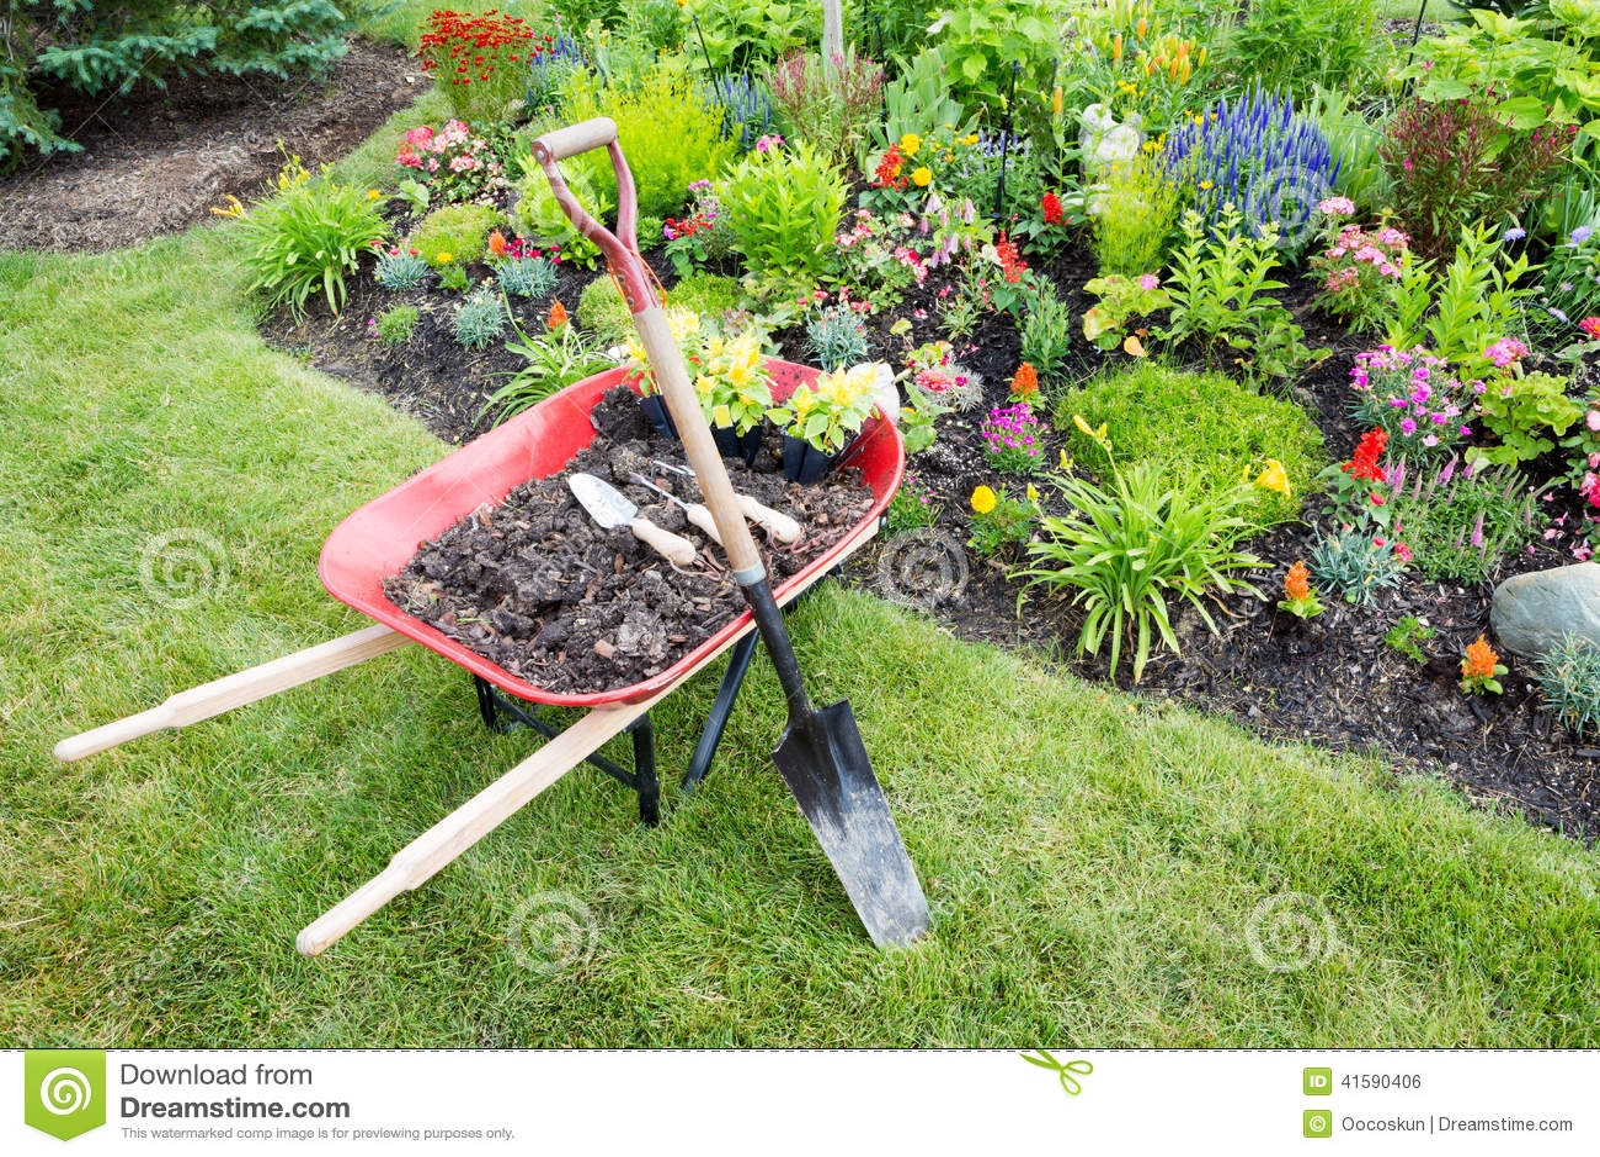 idee deco jardin avec cailloux idee deco parterre jardin of idee deco parterre jardin. Black Bedroom Furniture Sets. Home Design Ideas